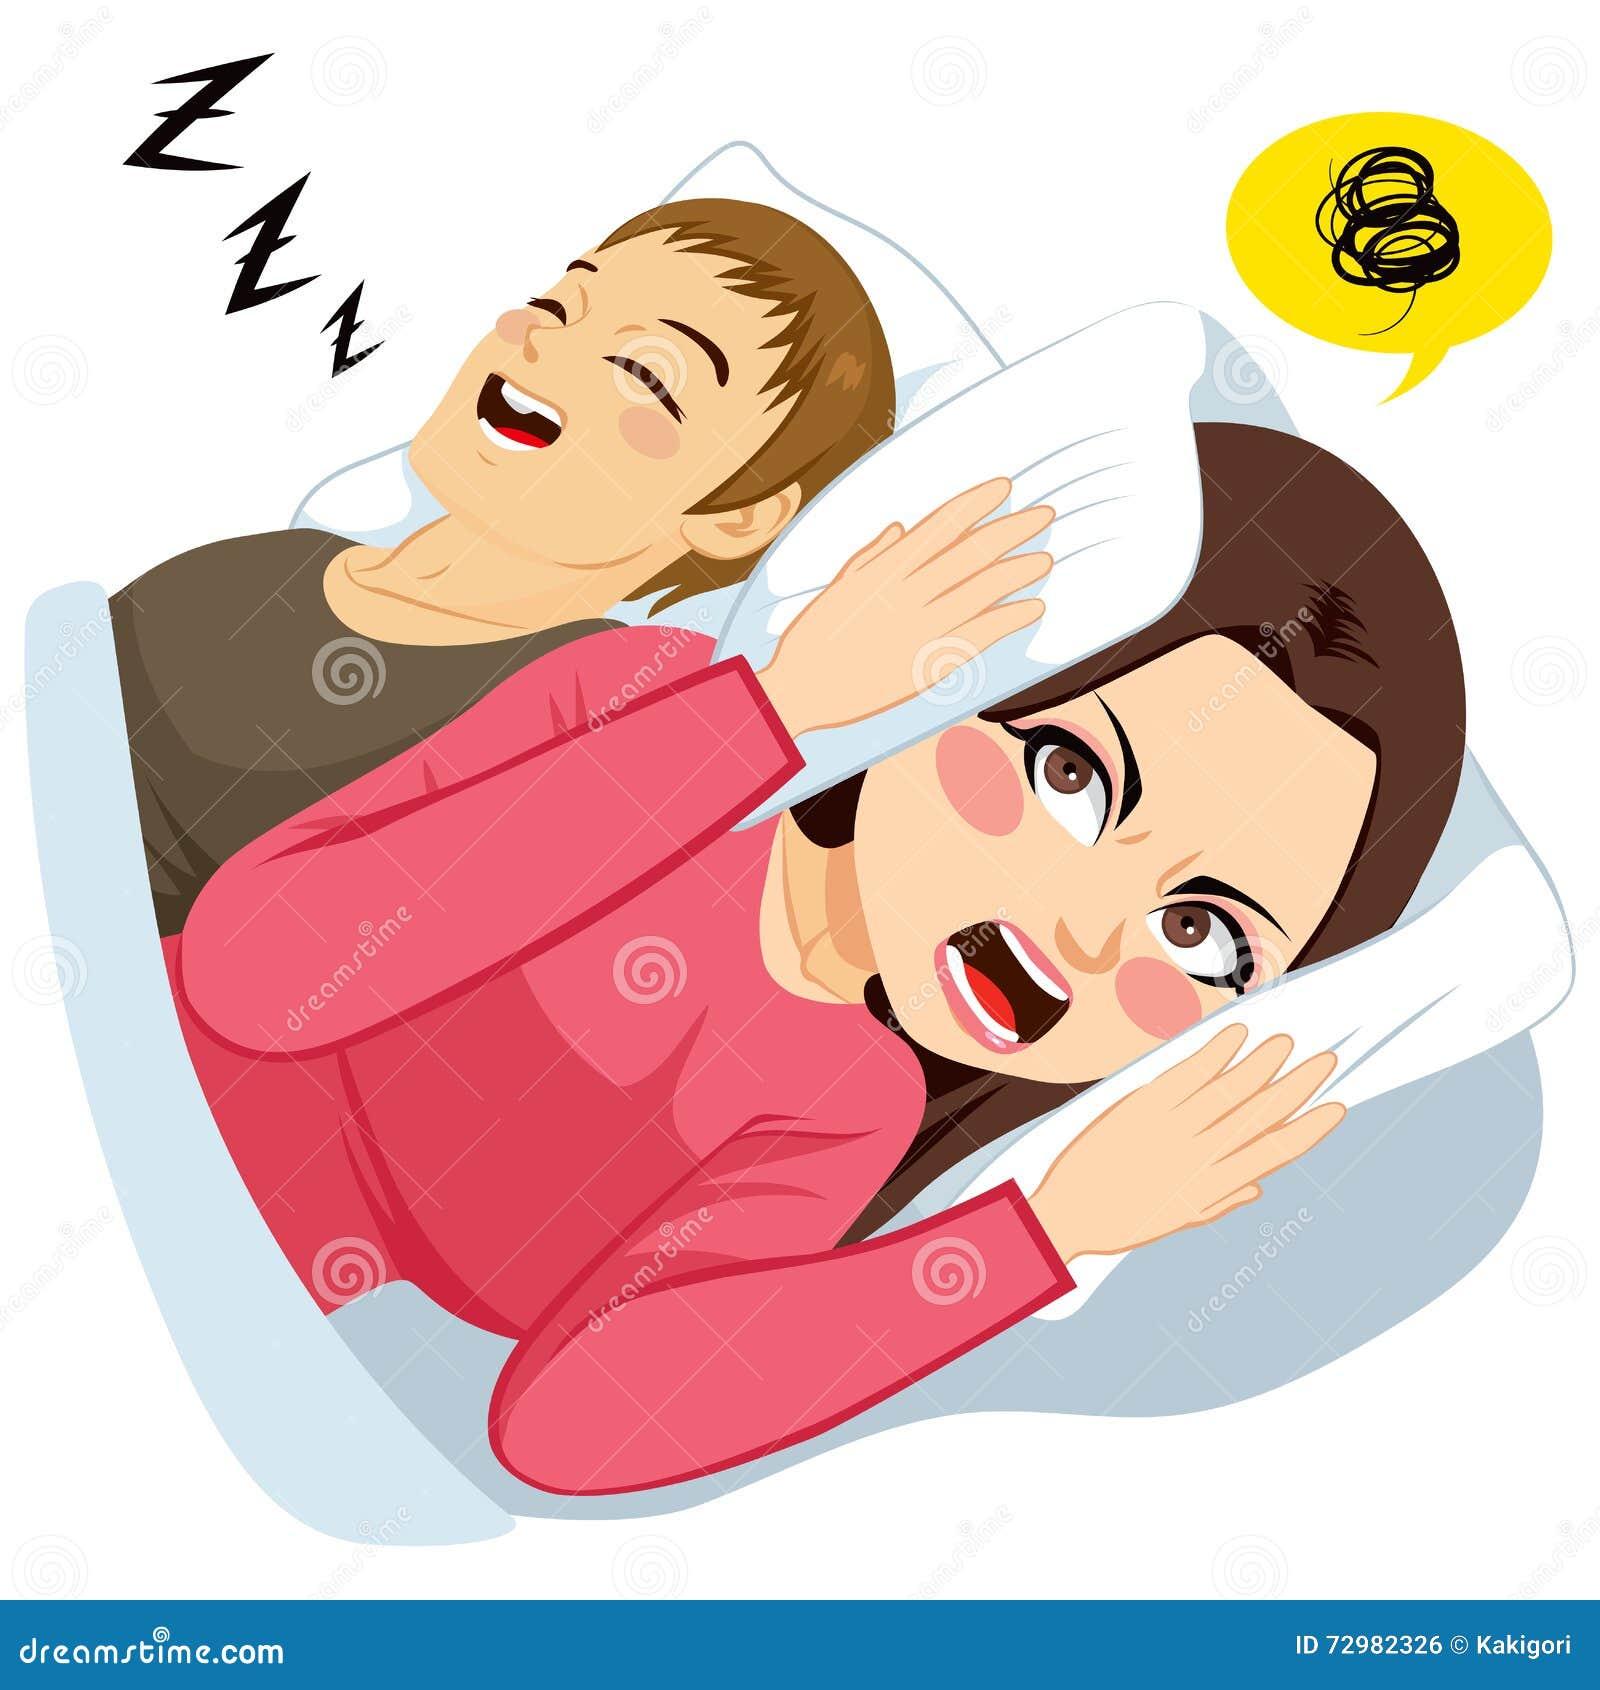 Man Snoring Noise Stock Vector - Image: 72982326